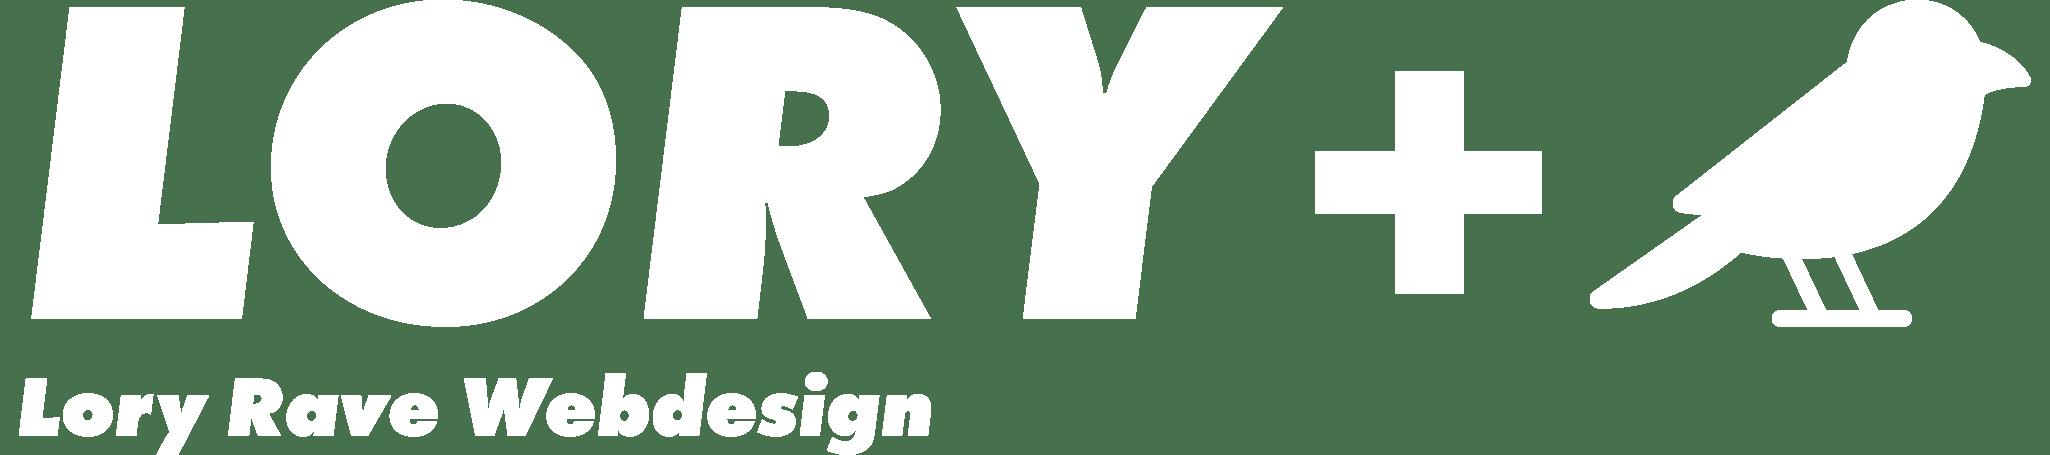 LoryRave Webdesign